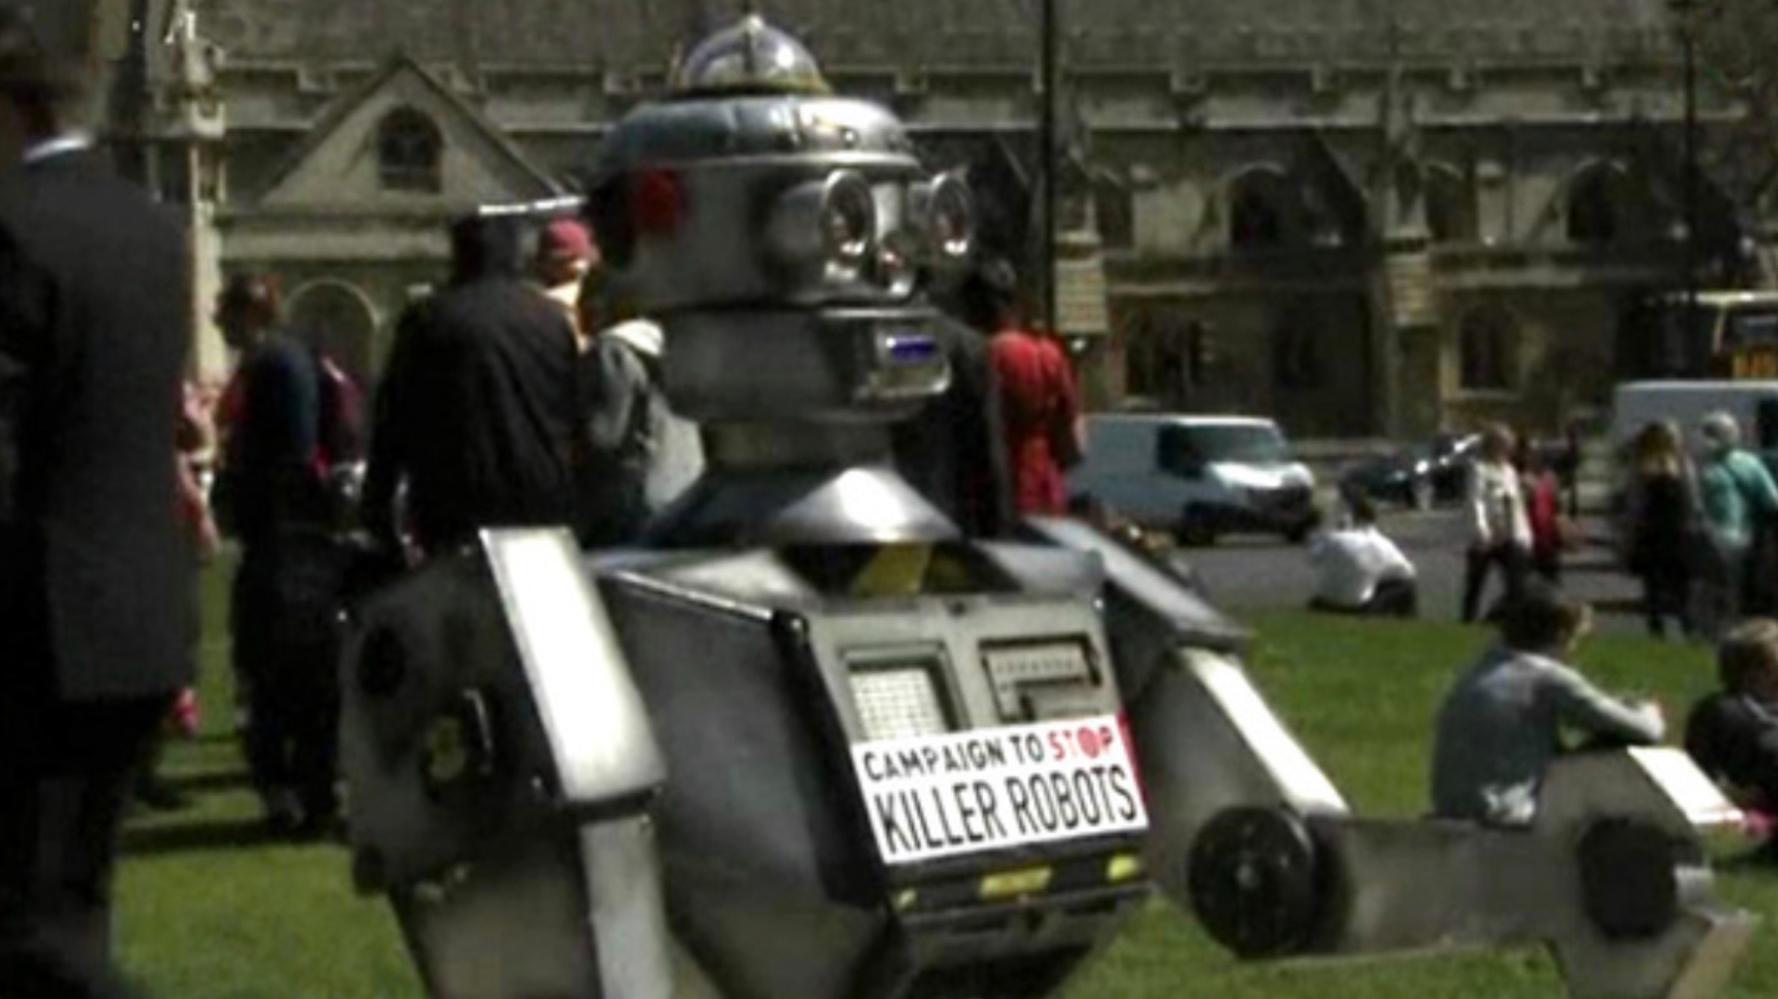 Killer-Roboter: Amazon, Microsoft und Palantir am Pranger